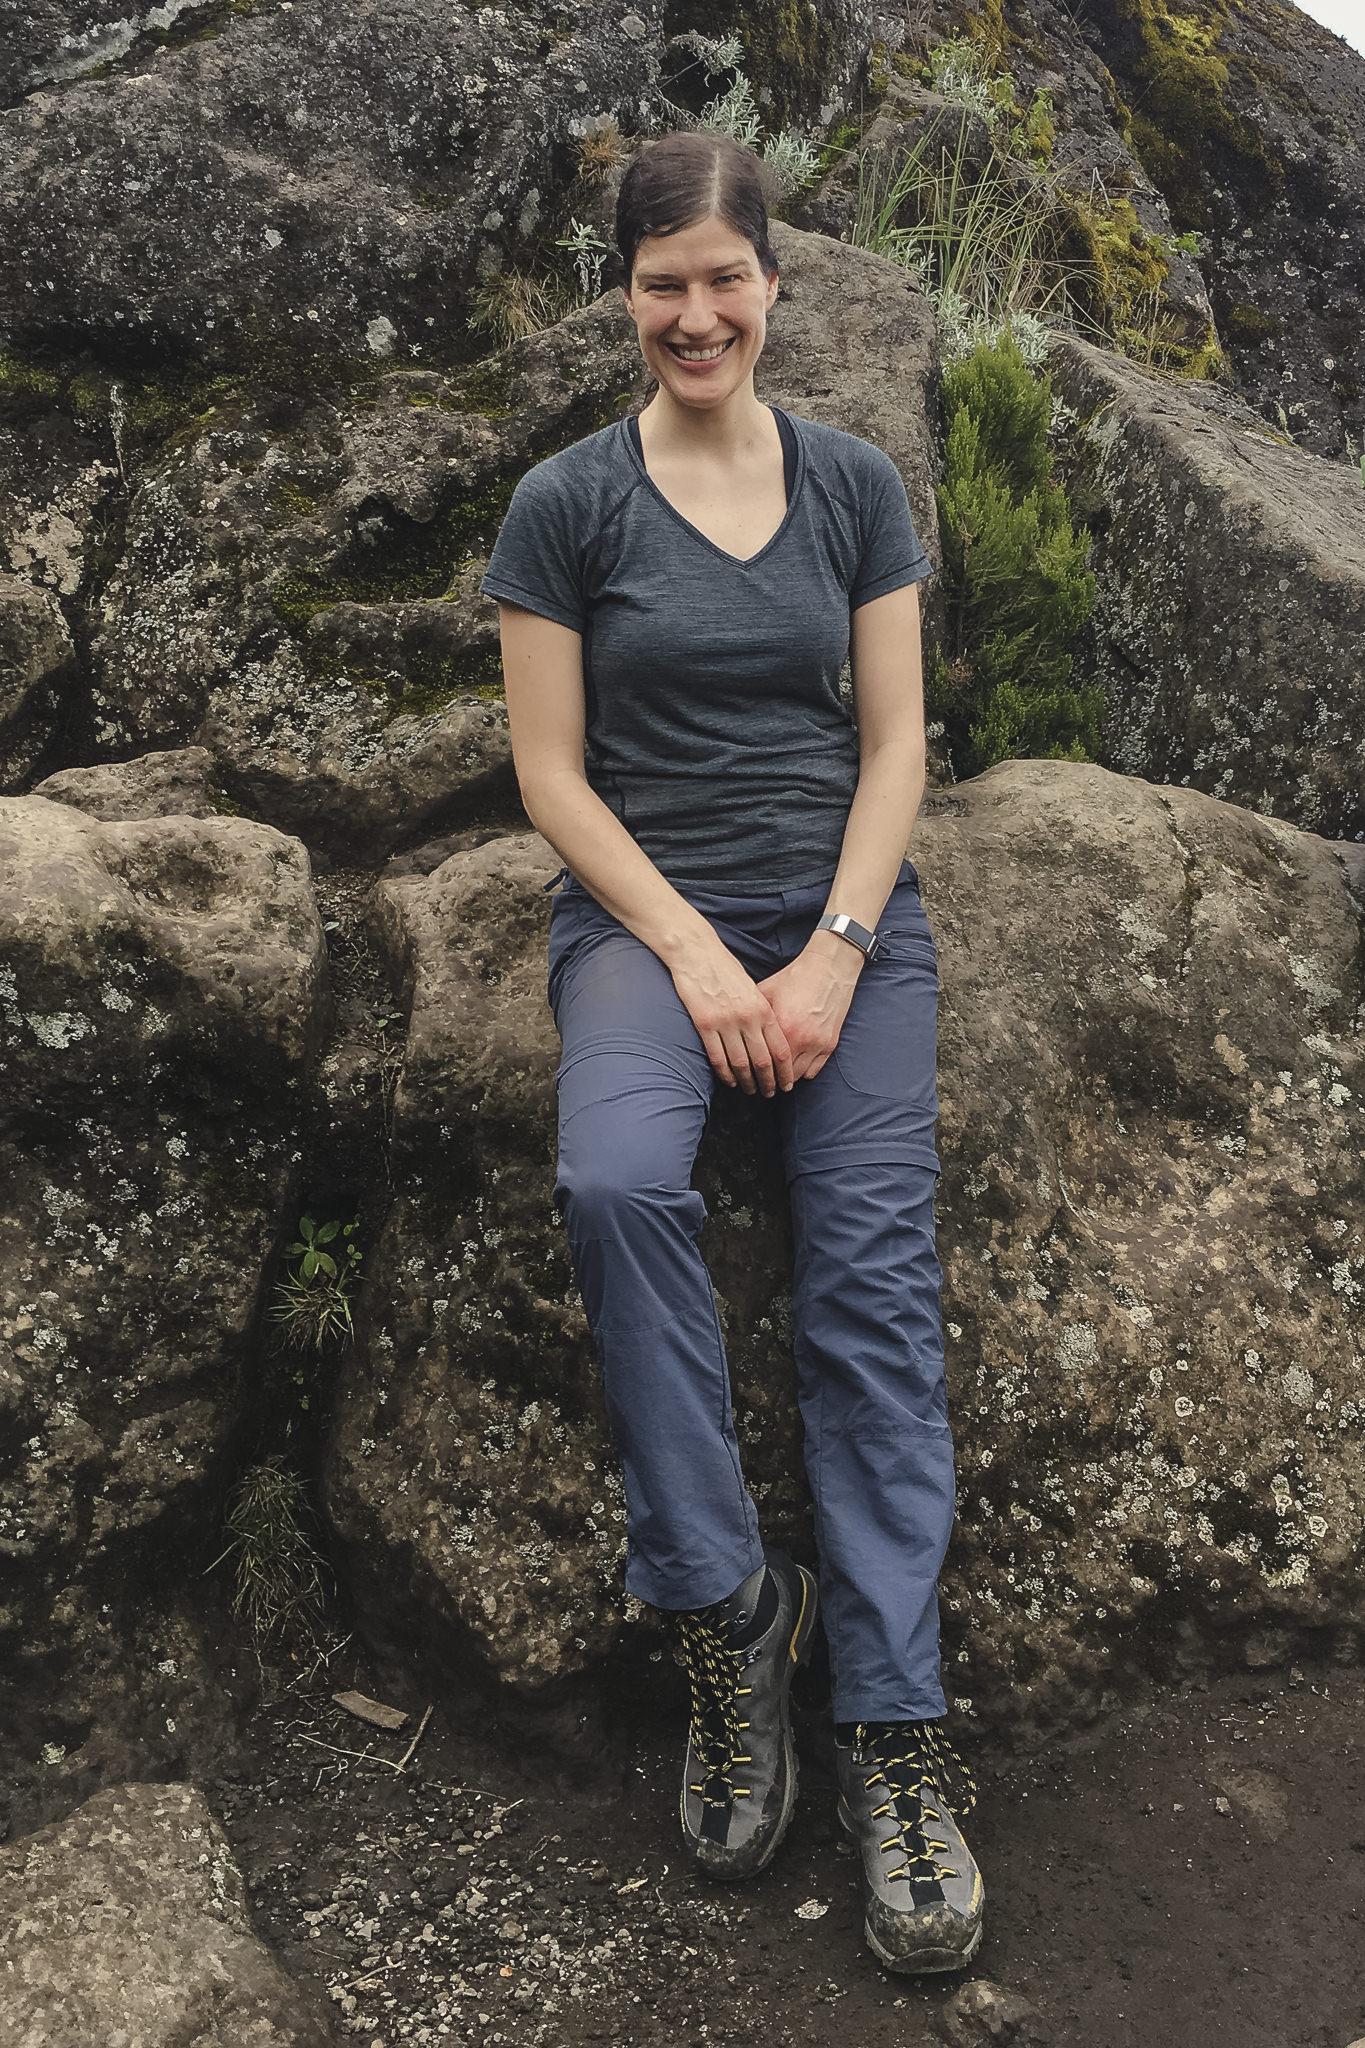 Kilimanjaro - 64